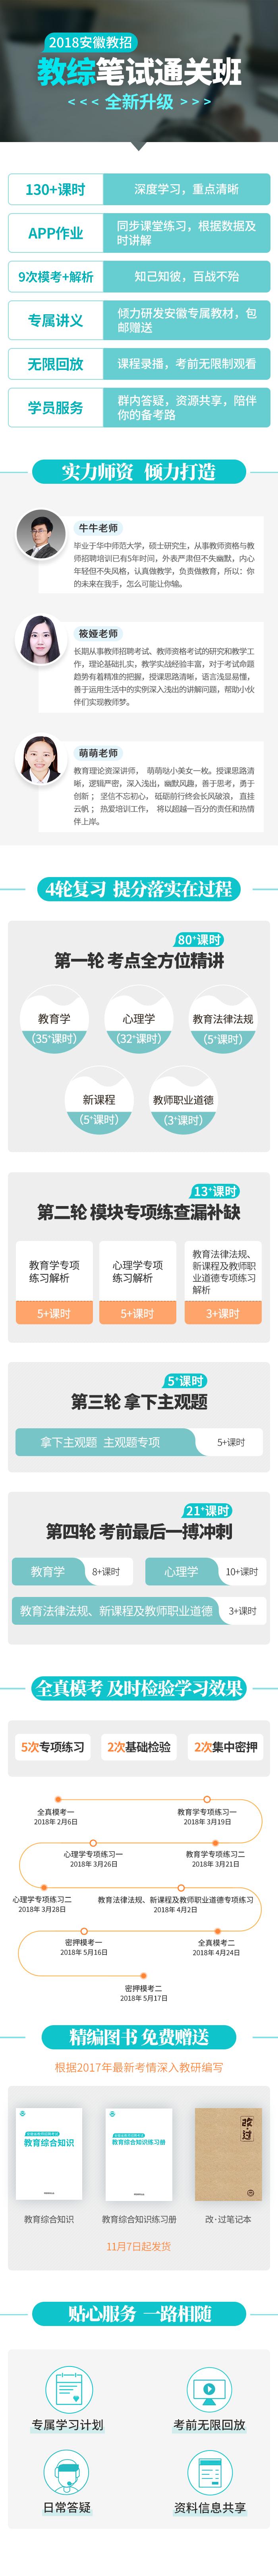 安徽教综详情页.png